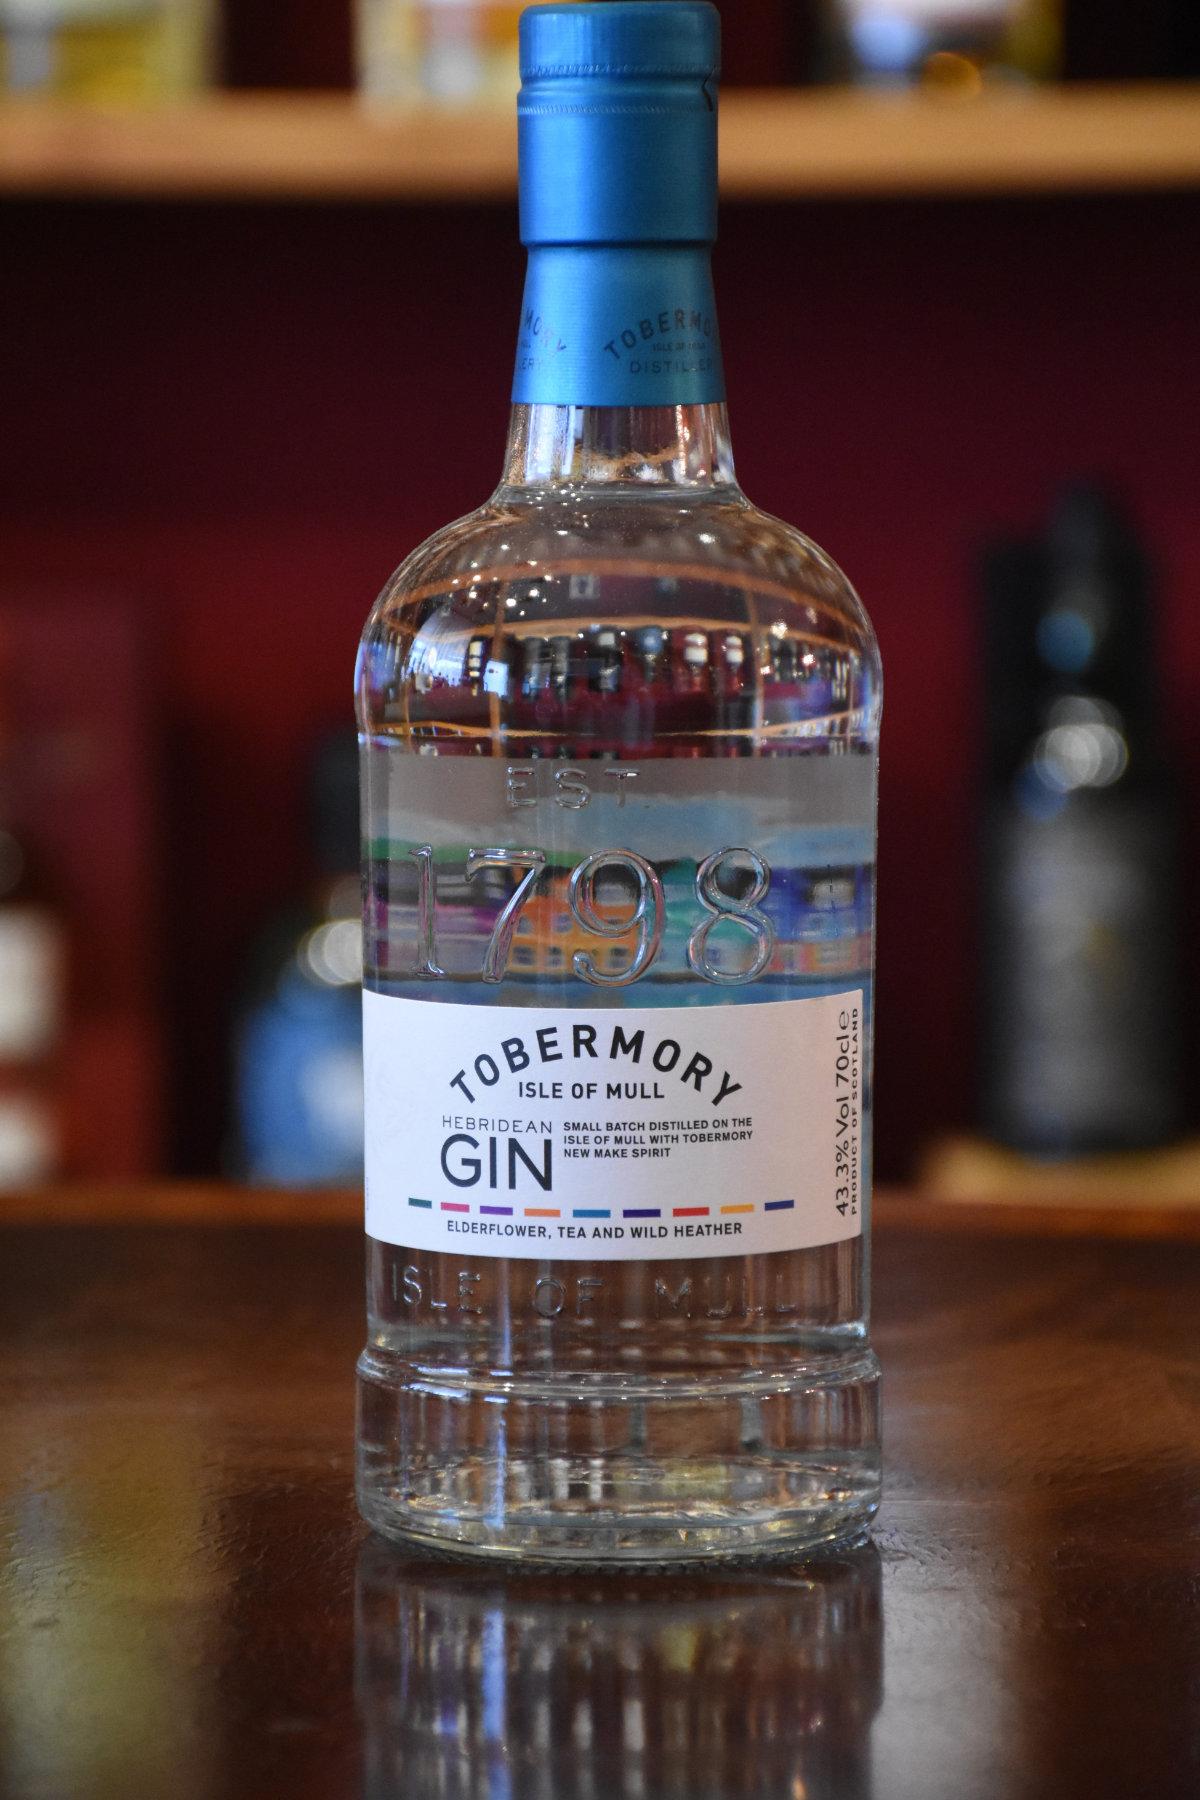 Tobermory Gin, Original Bottling Tobermory Distillery, Isle of Mull, Scotland, 43,3% Alc. Vol.